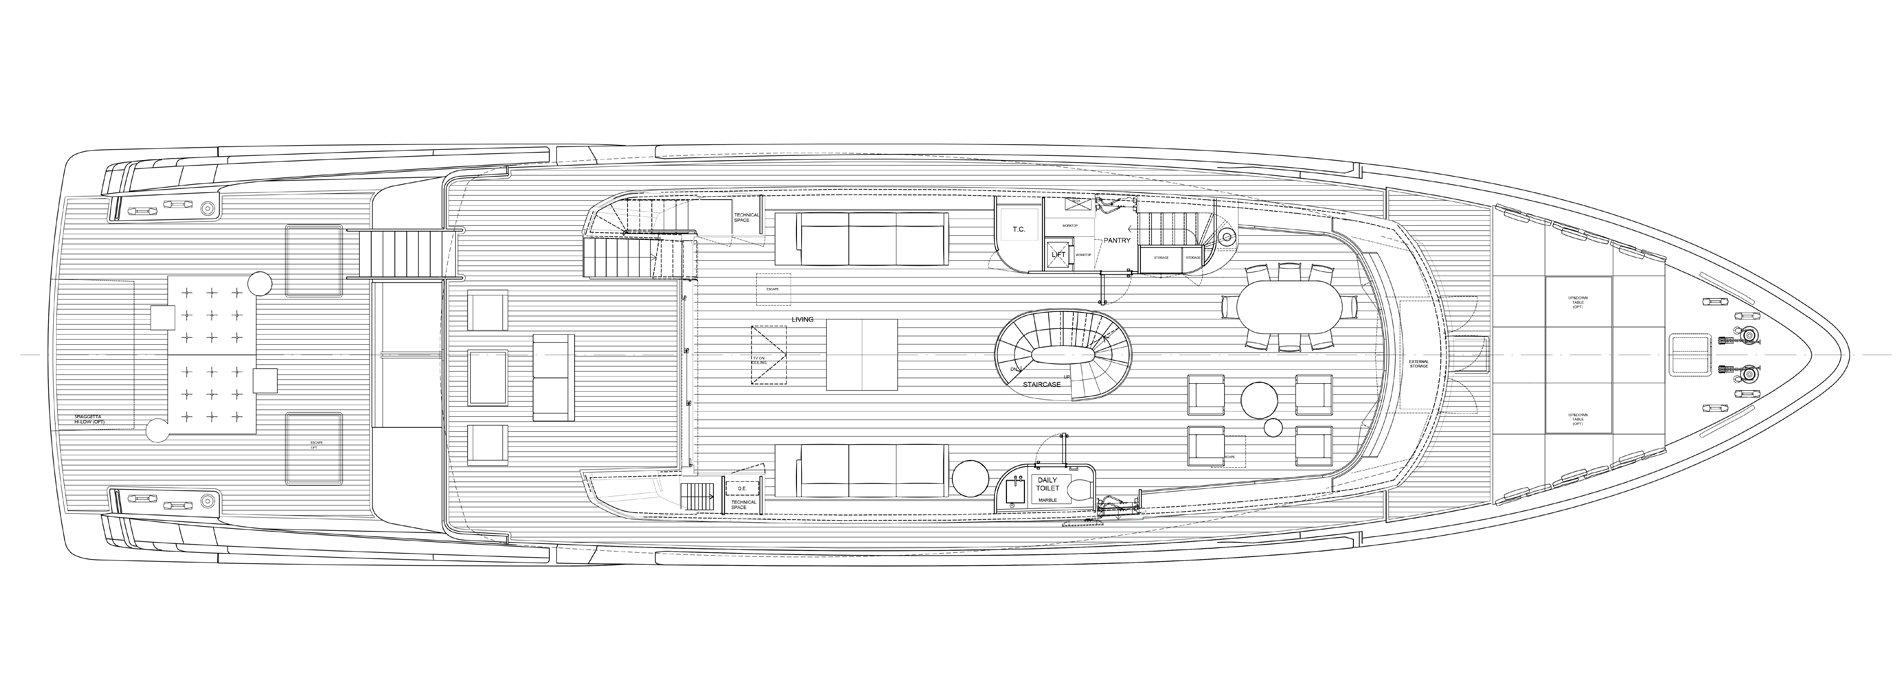 Sanlorenzo Yachts SX112 Главная палуба  версия A